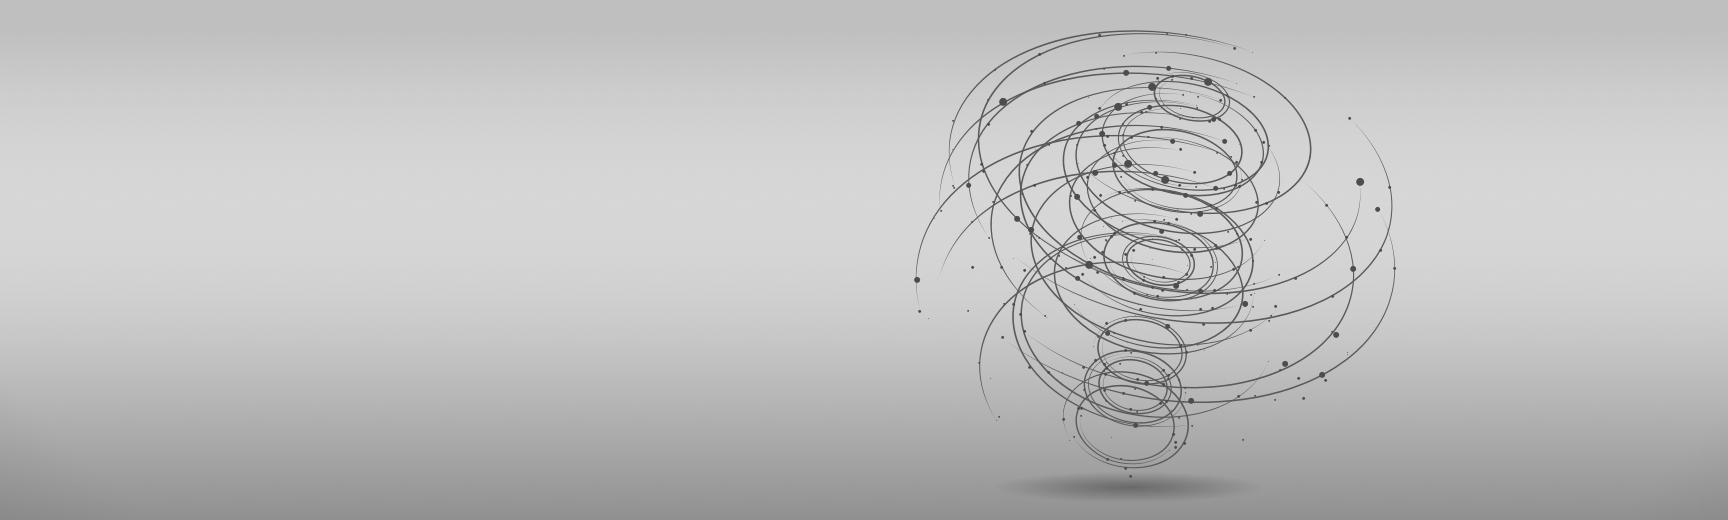 spiral noclip